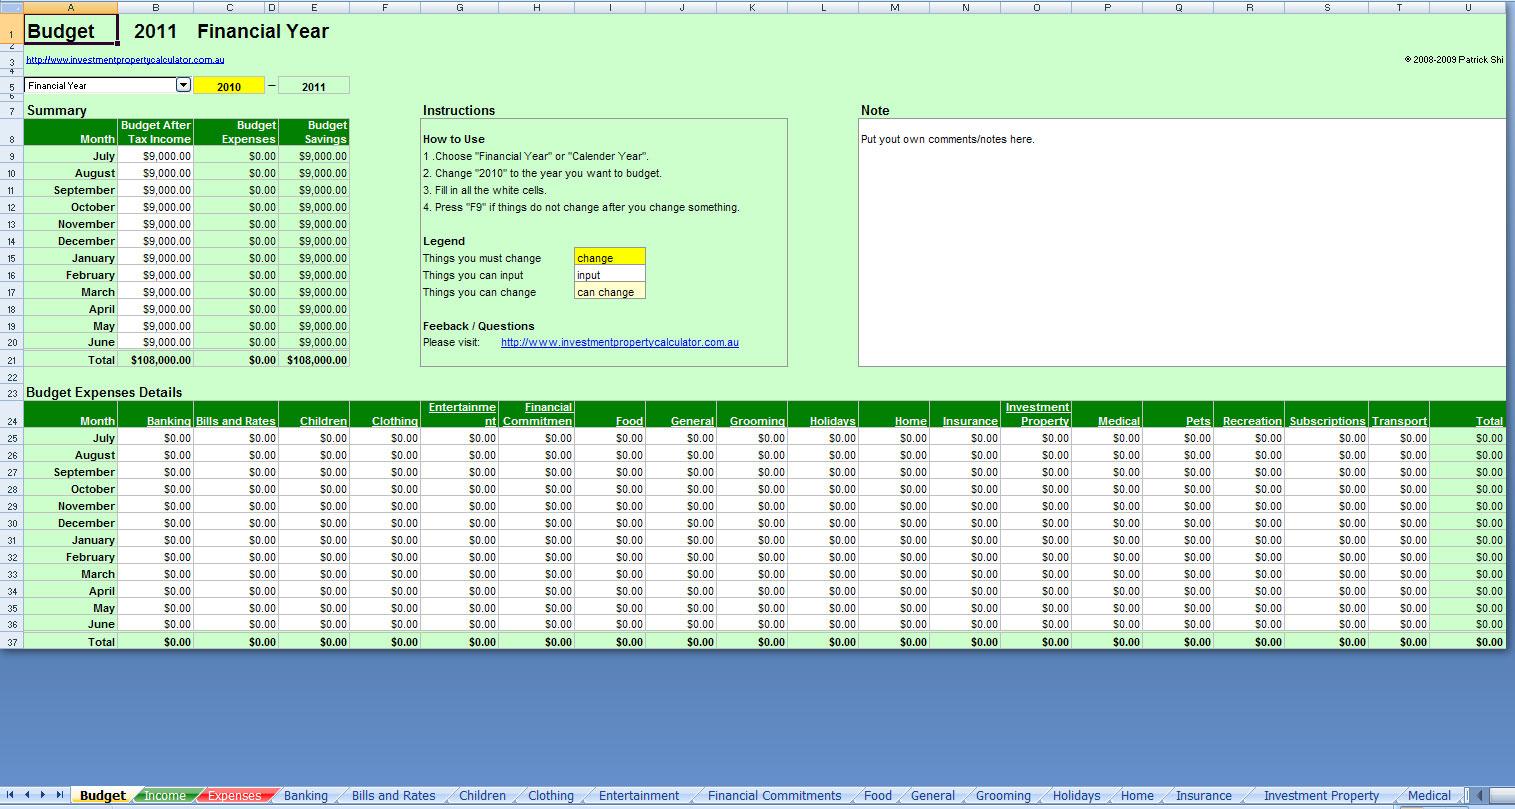 Debt Avalanche Calculator Spreadsheet Intended For Budget Calculator Spreadsheet For 67 Best Image Debt Avalanche